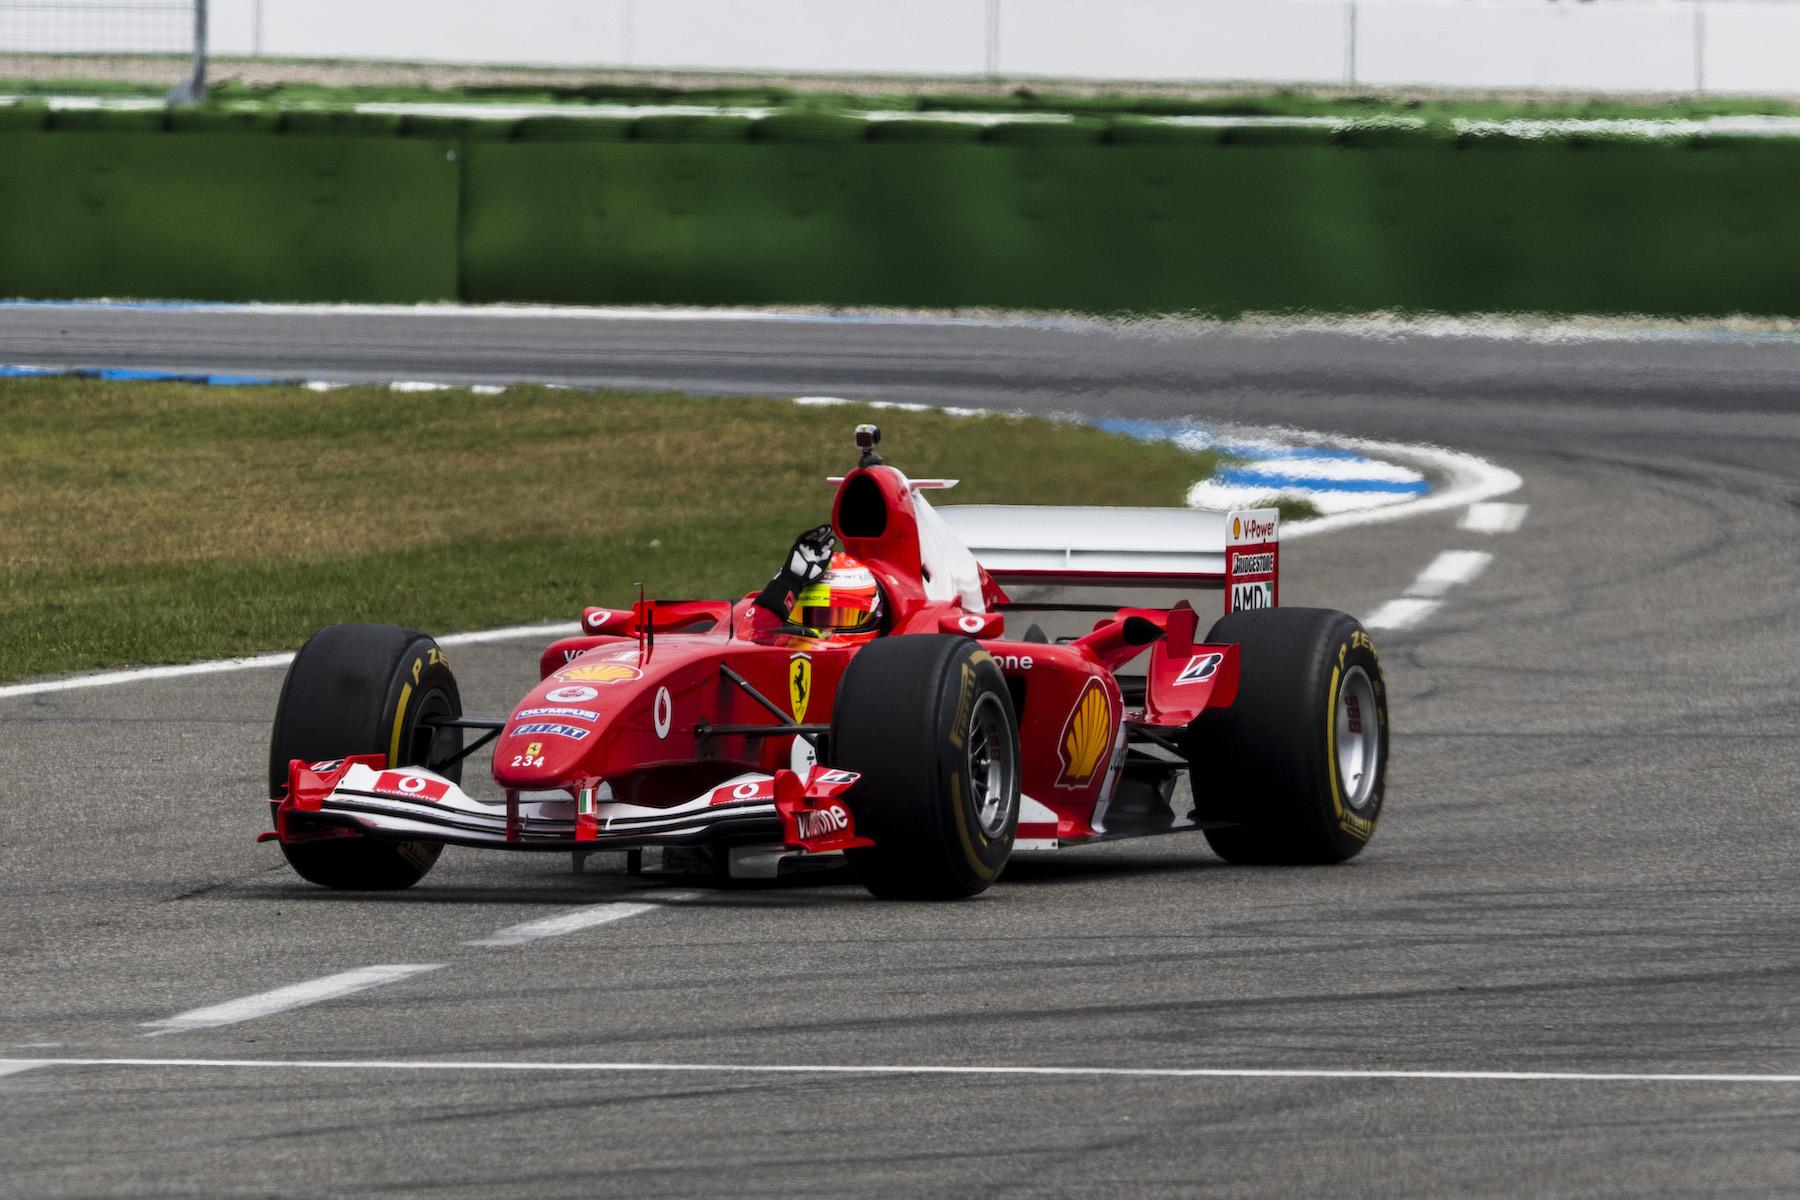 2019 Mick Schumacher | Ferrari F2004 | 2019 German GP 7 copy.jpg